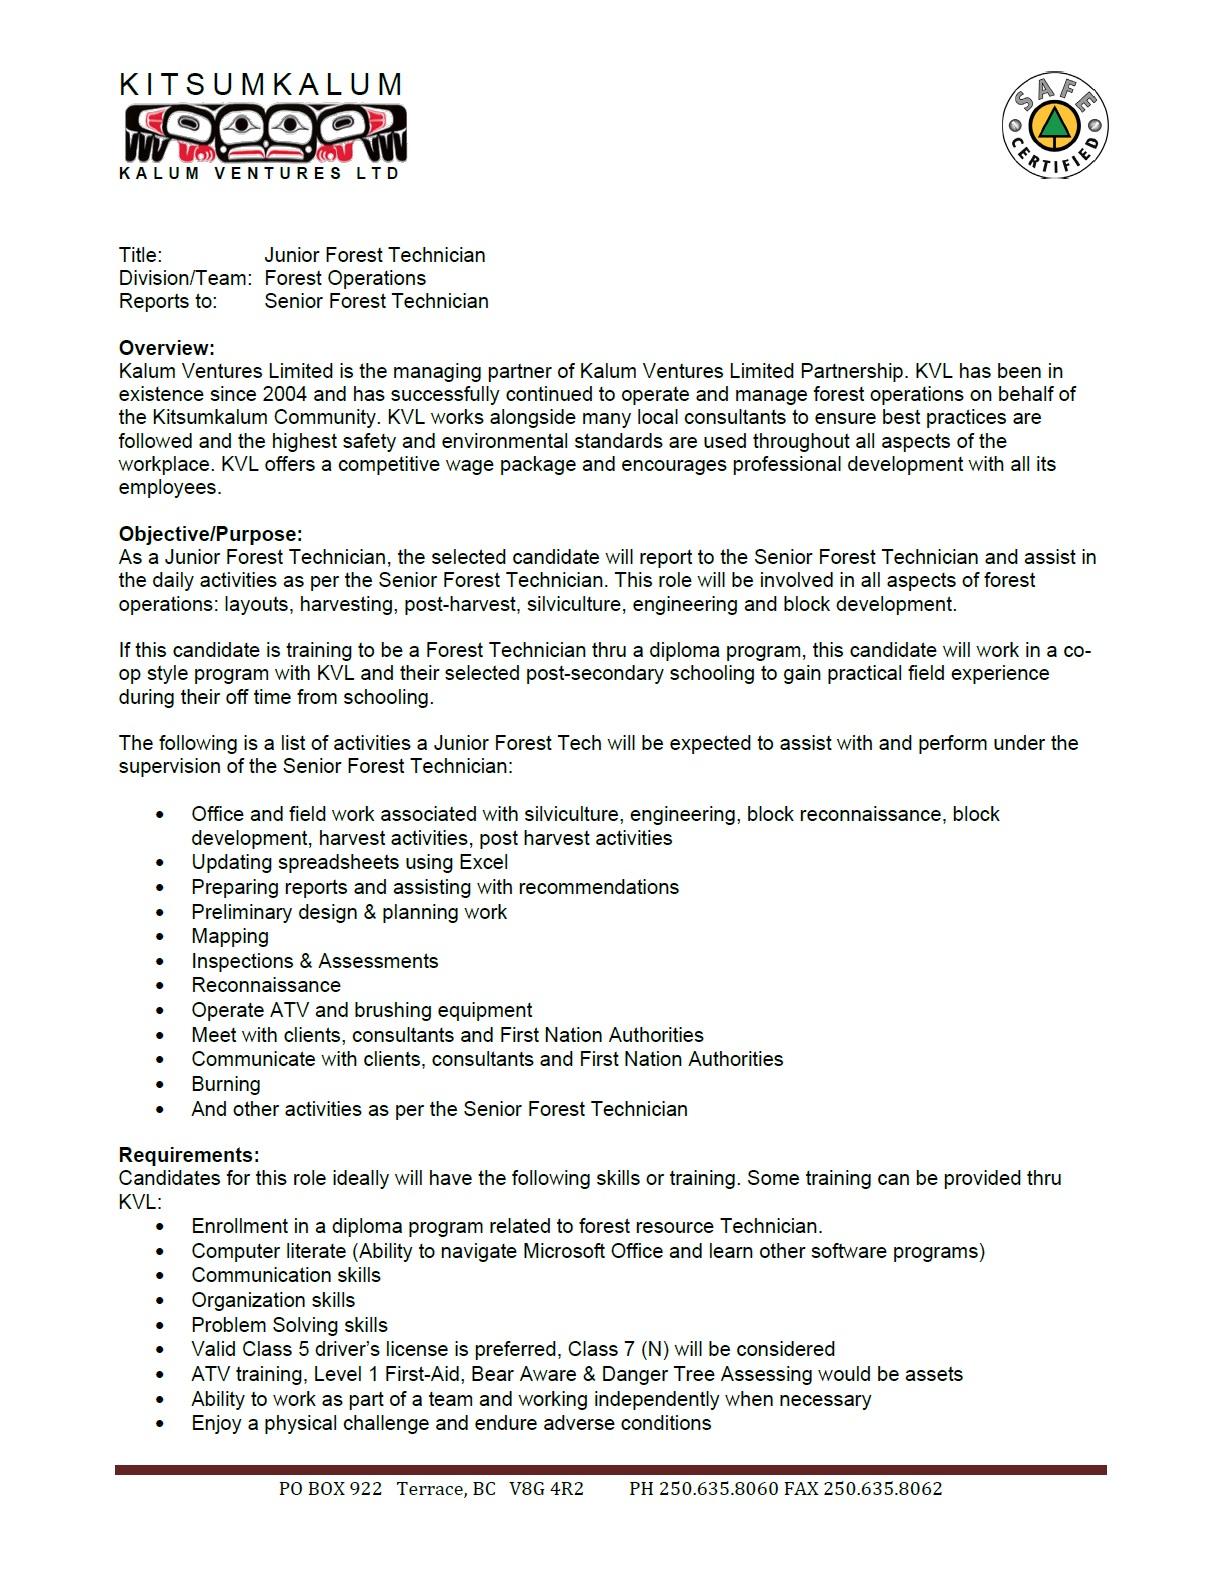 Job Posting with KVL: Junior Forest Technician